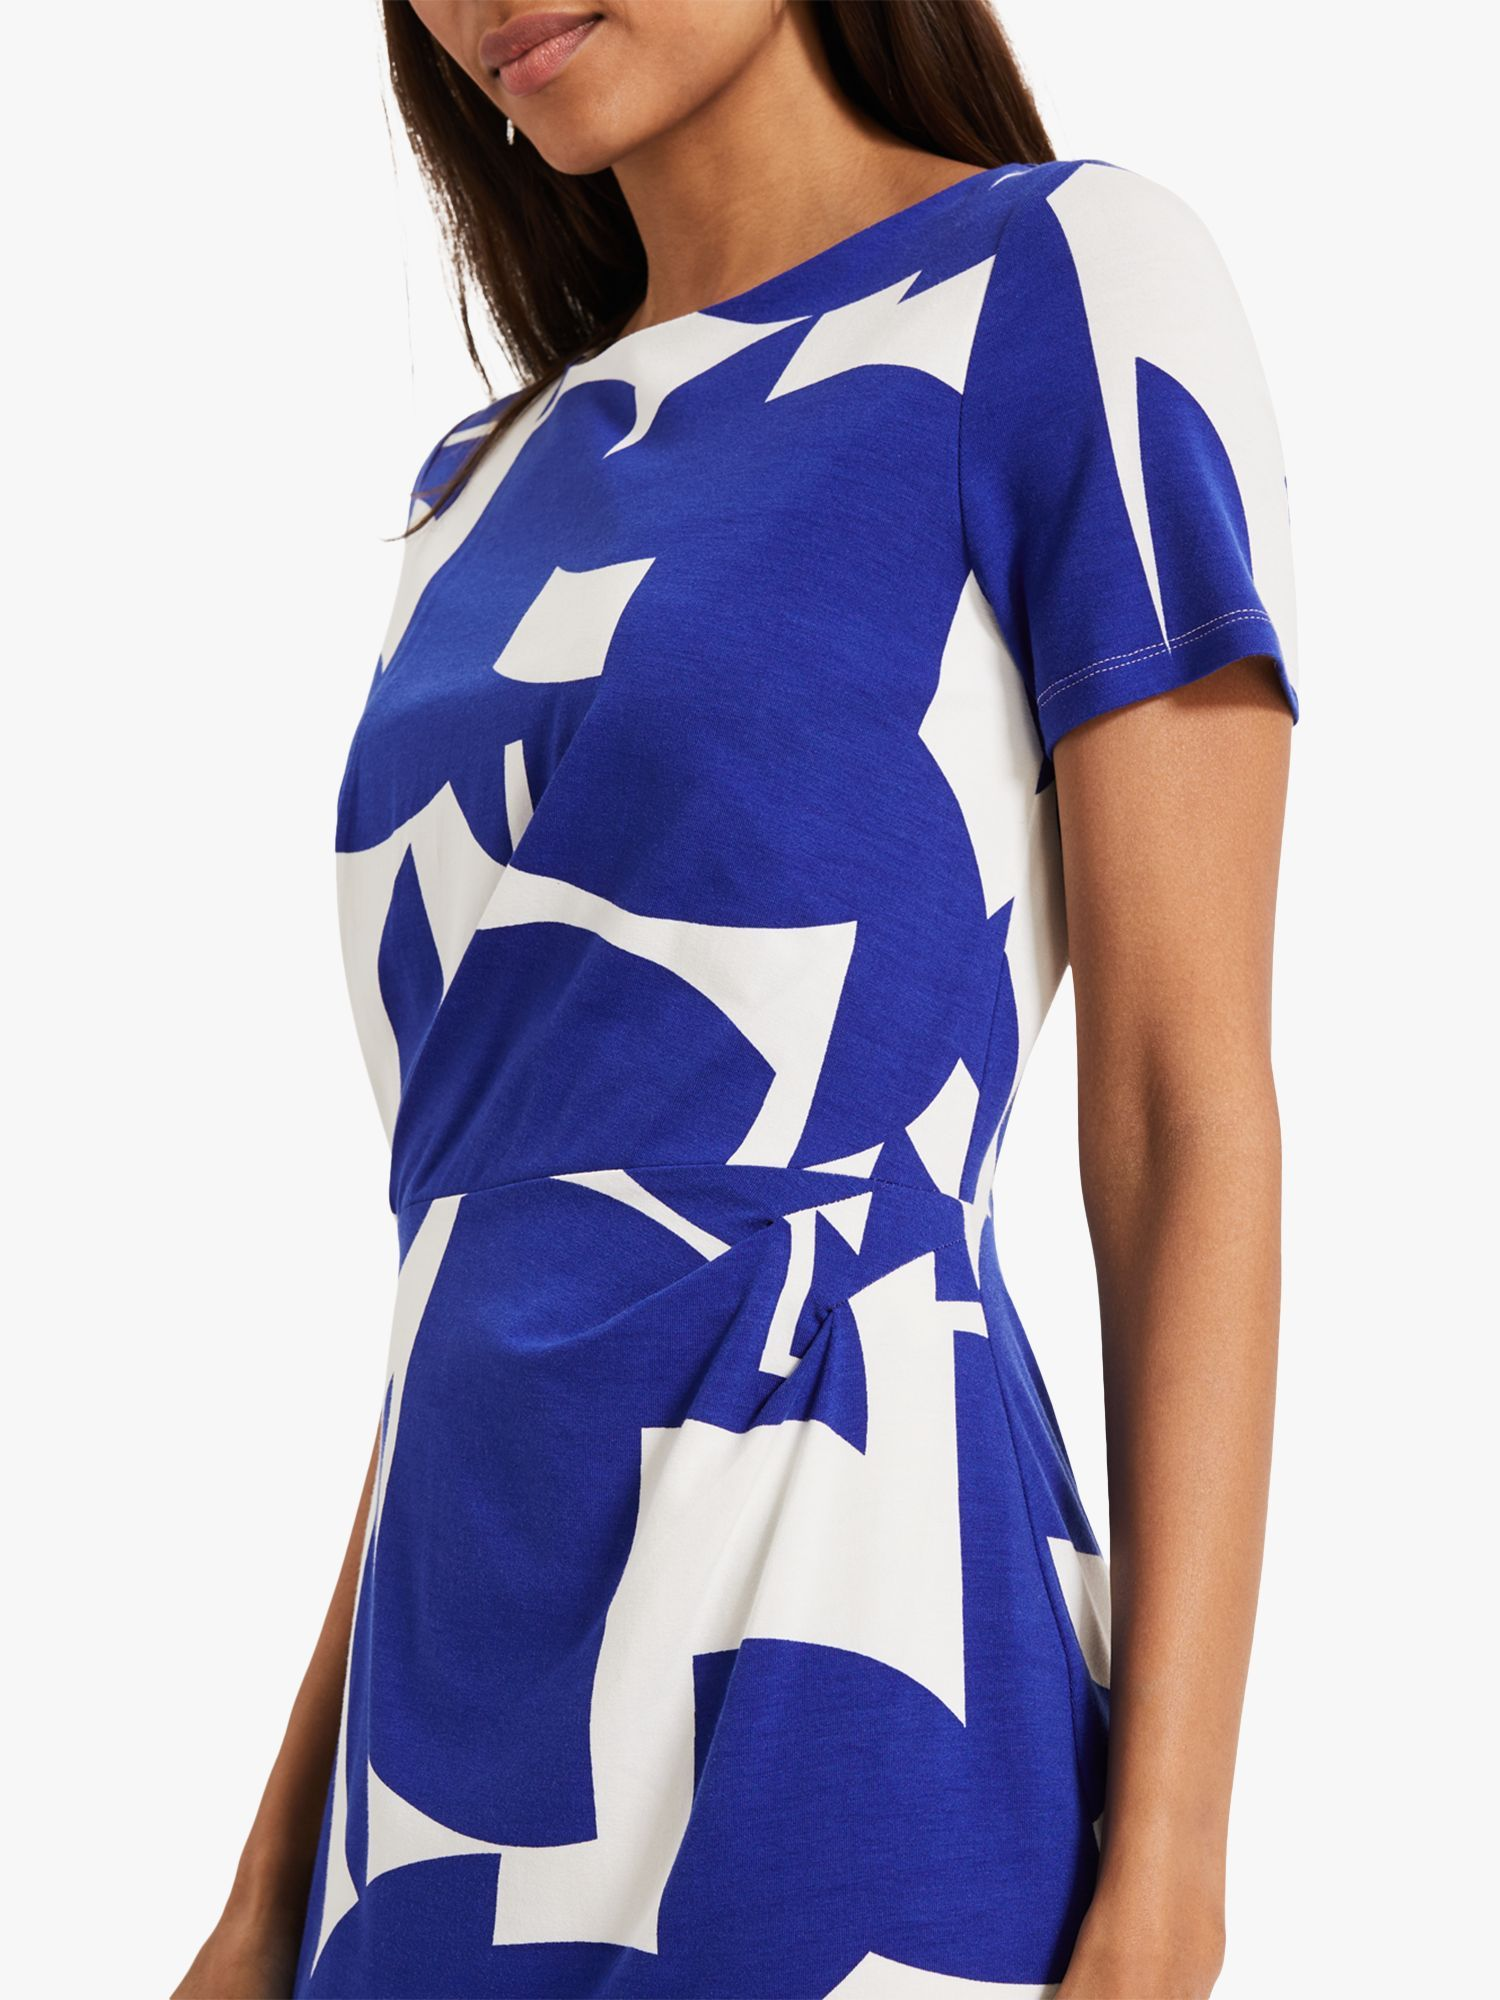 Phase Eight Gretchen Print Dress, Ivory/Cobalt #cobaltdress